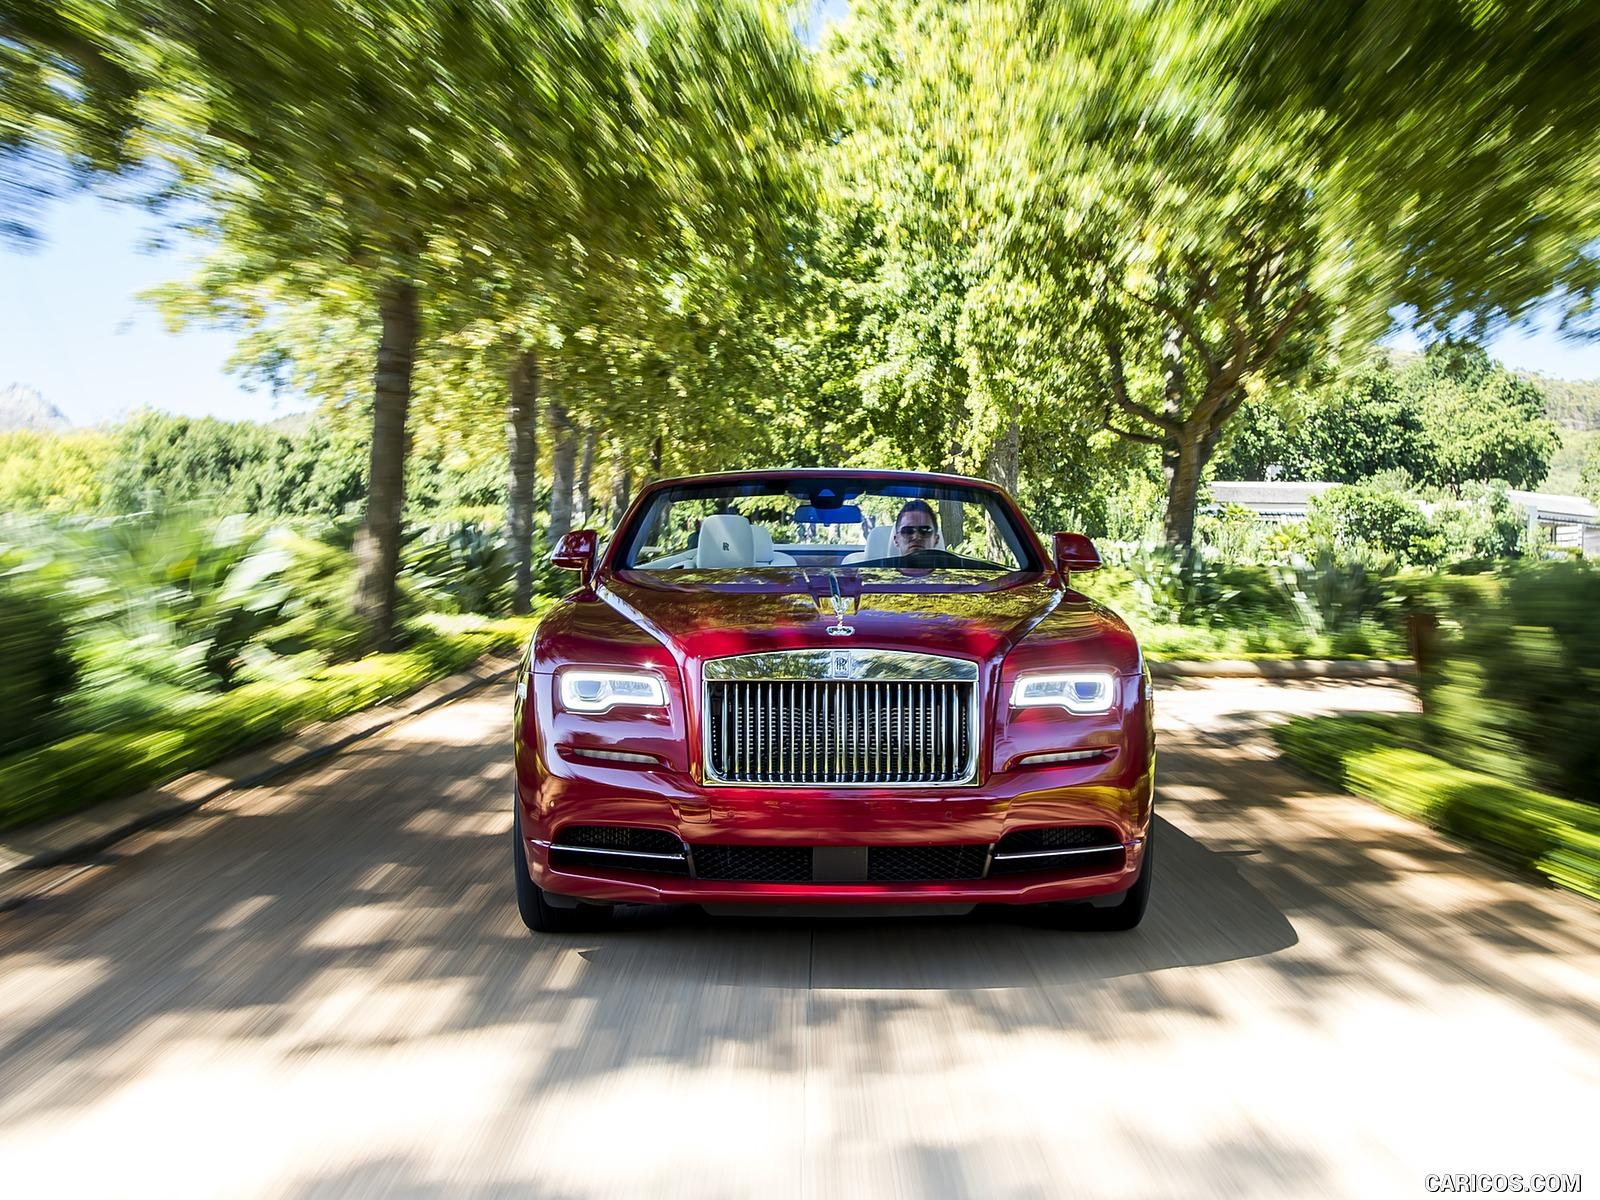 Exotic Car Rental Baton Rouge Louisiana